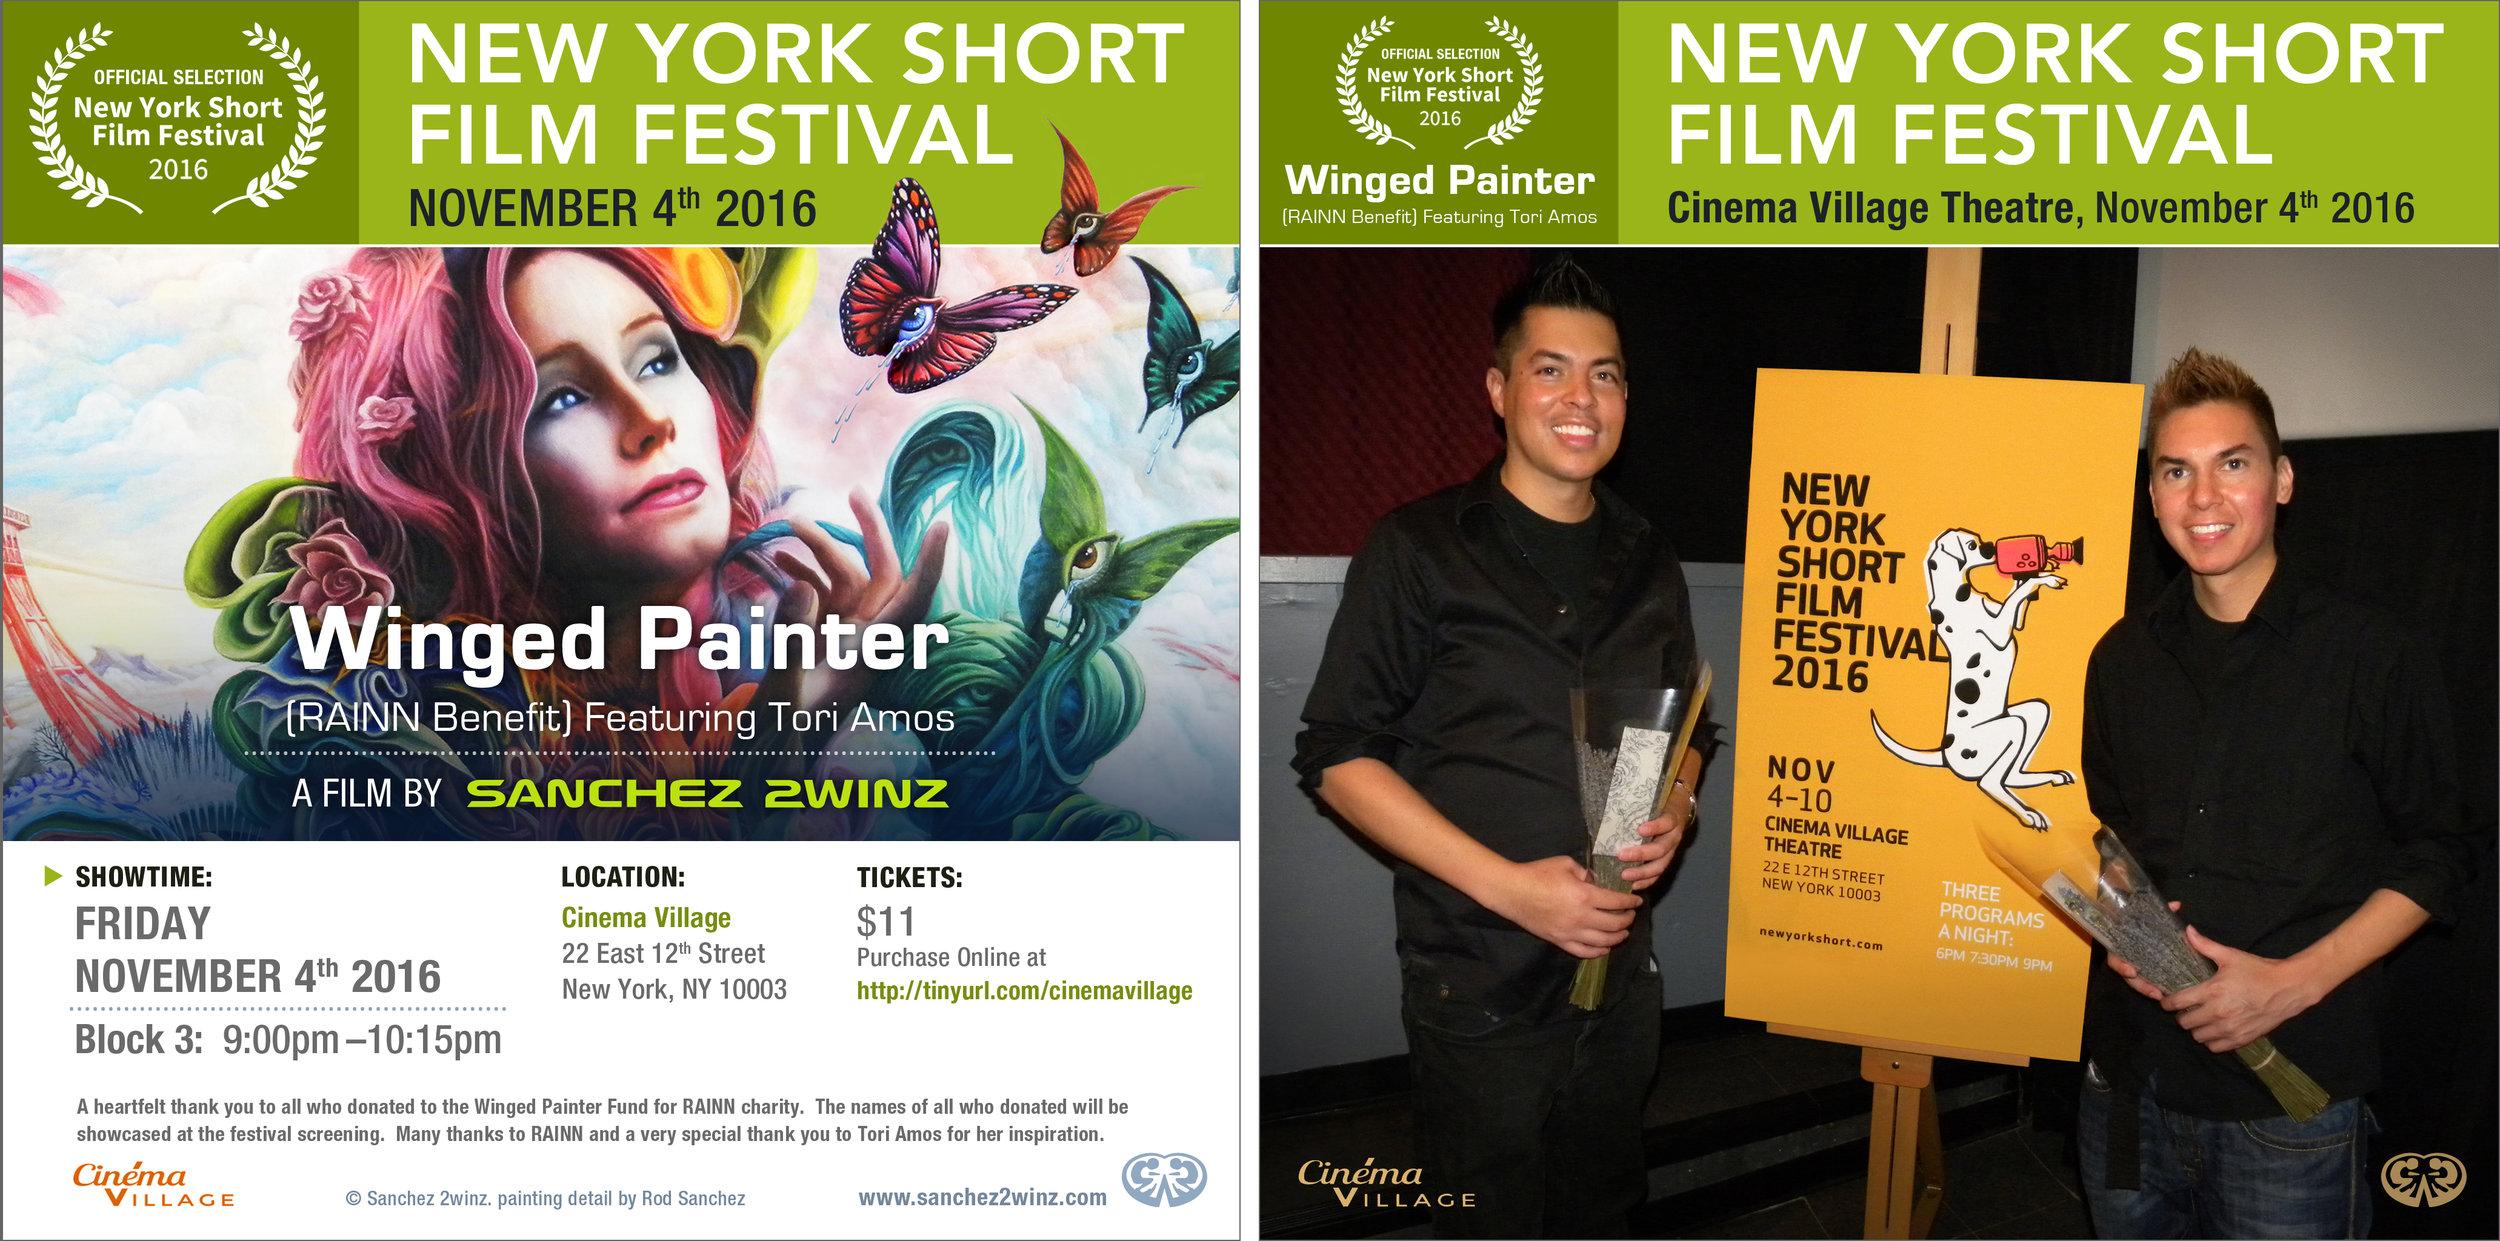 News_NewYorkShortFilmFestival_WingedPainter_RodSanchez_Sanchez2winz.jpg